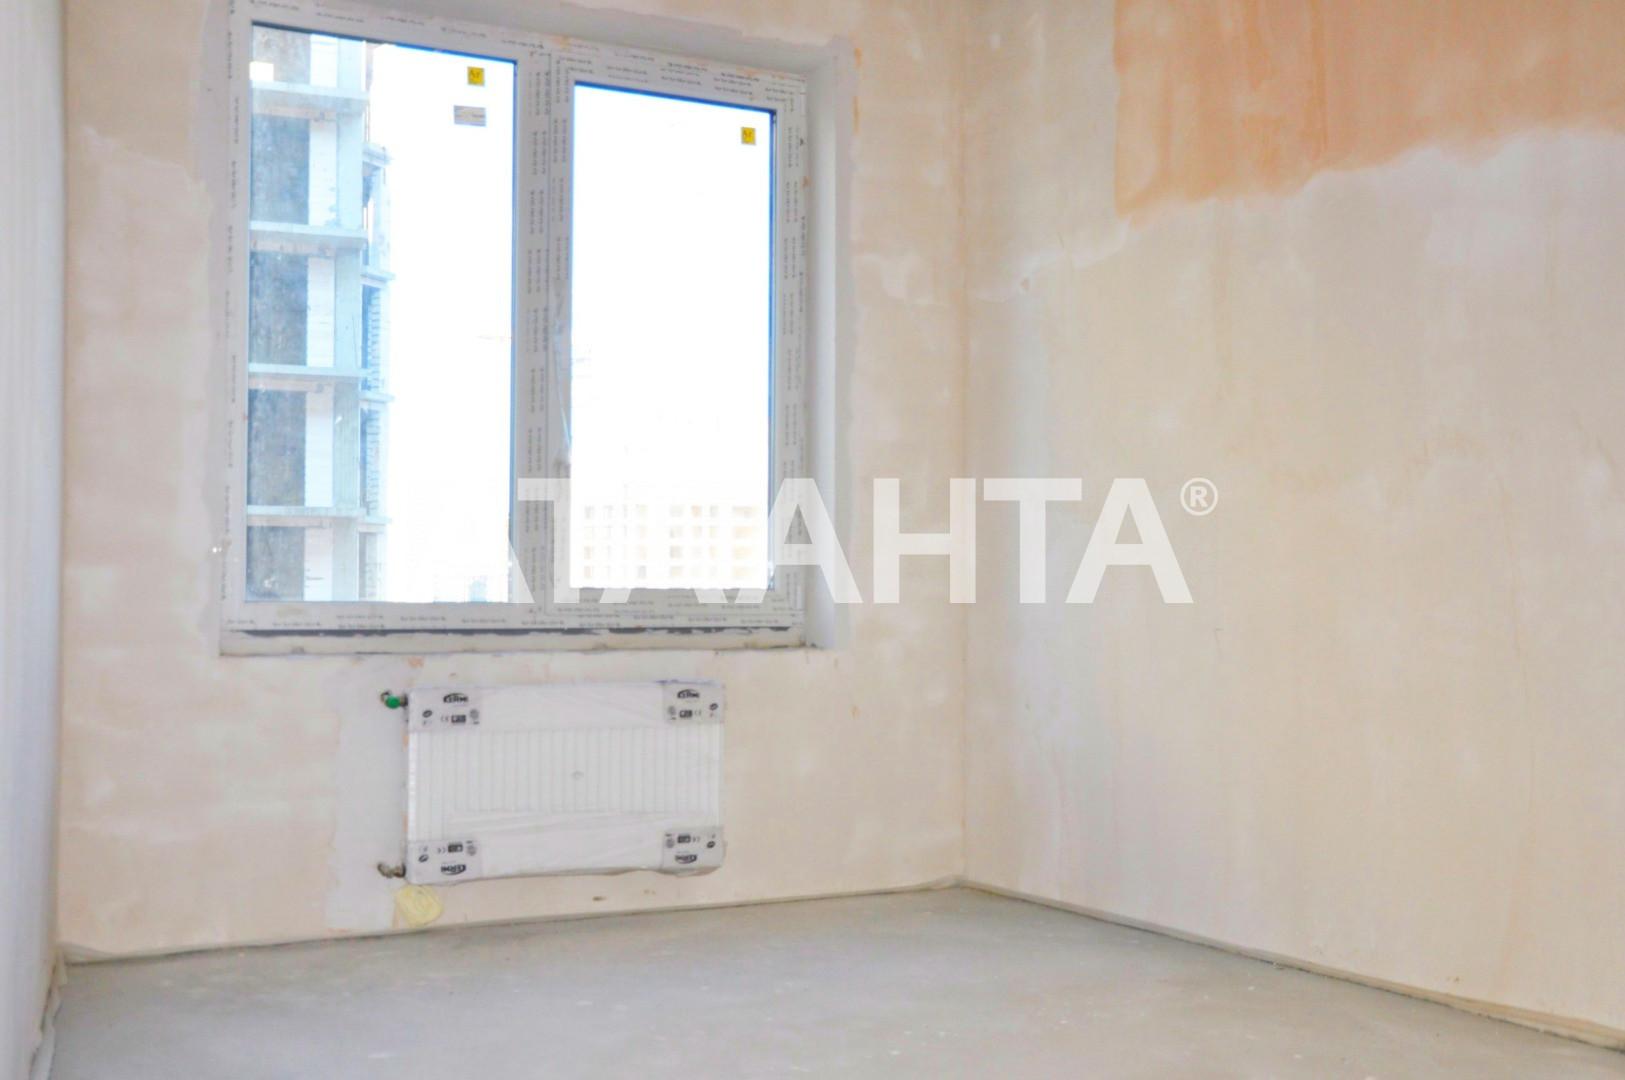 Продается 2-комнатная Квартира на ул. Генуэзская — 68 100 у.е. (фото №4)